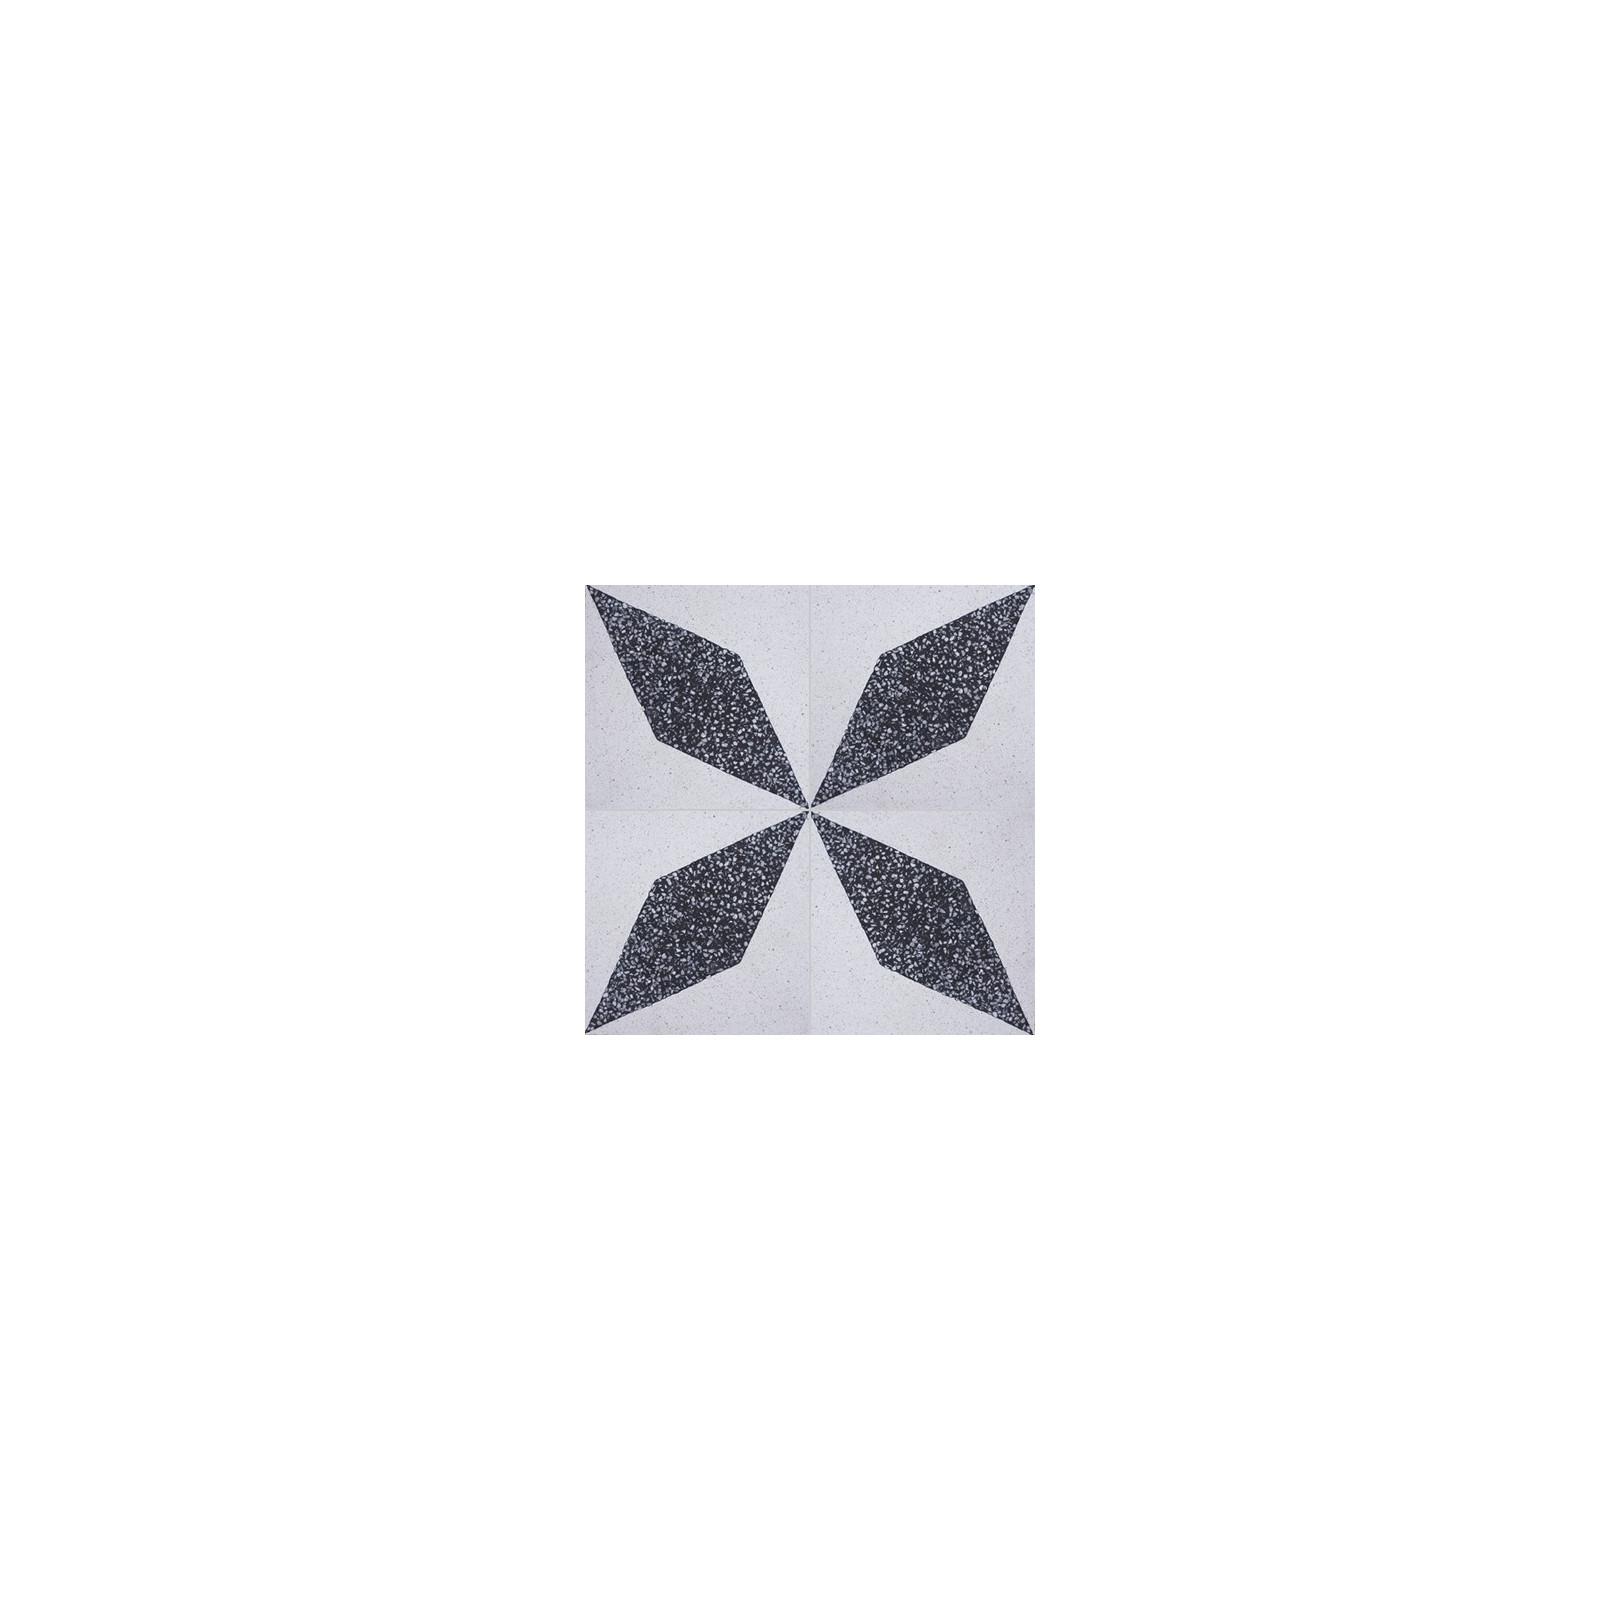 Carreau de terrazzo motif noir et blanc Lhassa TU 10.301B